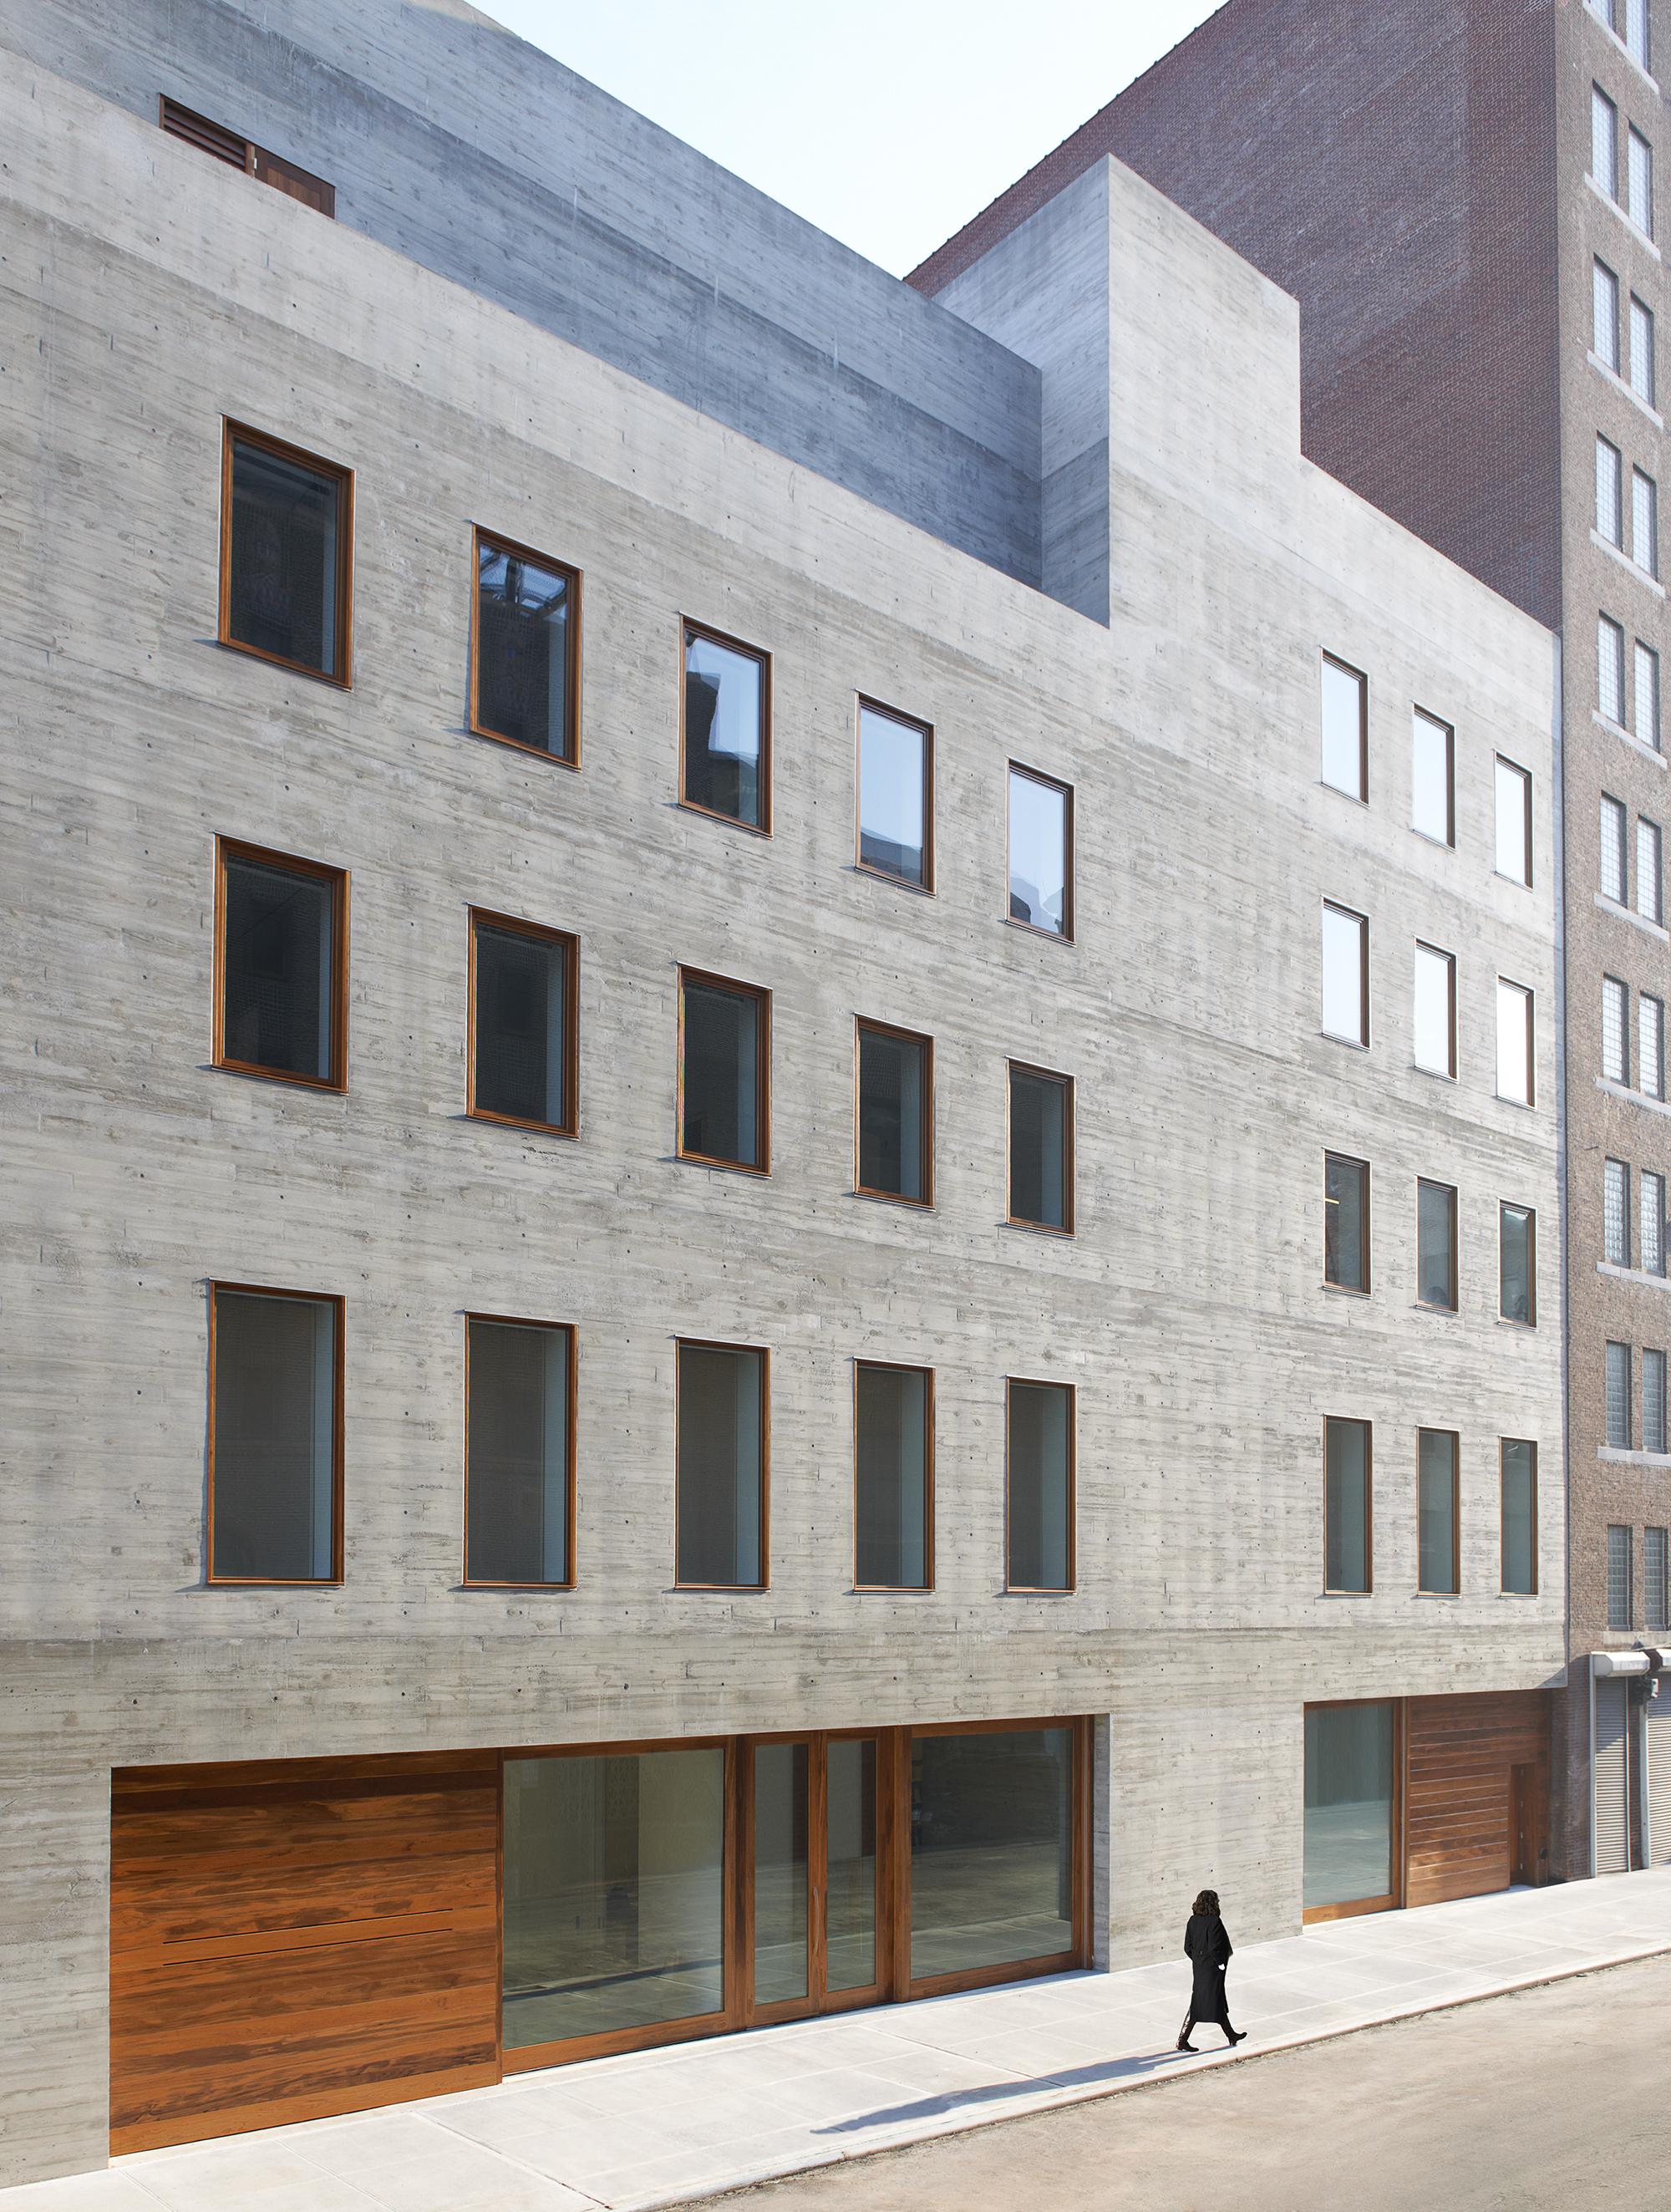 David Zwirner 20th Street, New York, NY, Selldorf Architects. Photo: Jason Schmidt, courtesy of Selldorf Architects.